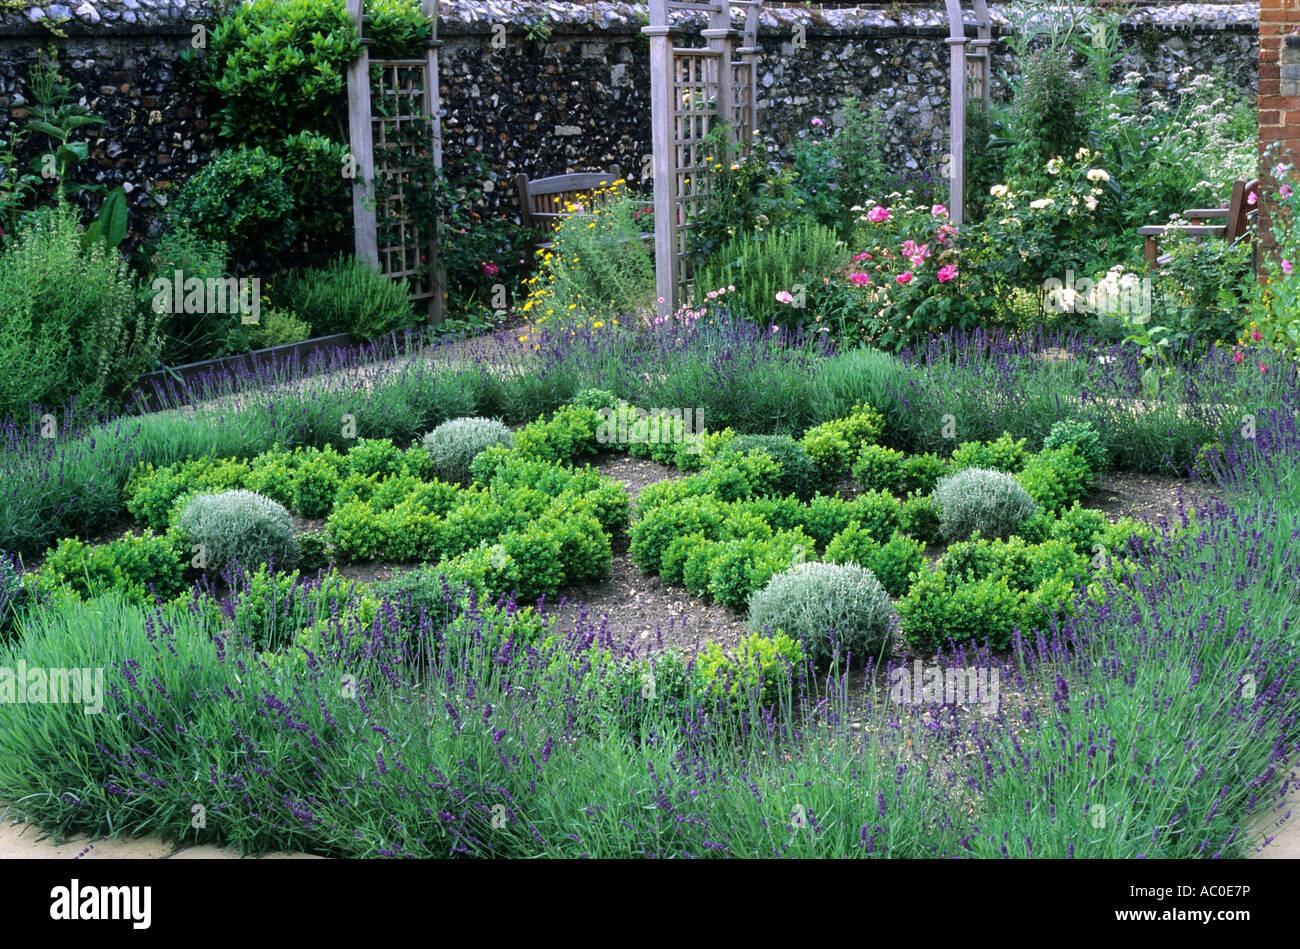 Herb Knot Garden Lavender Box Hedges Trellis Arches Stock